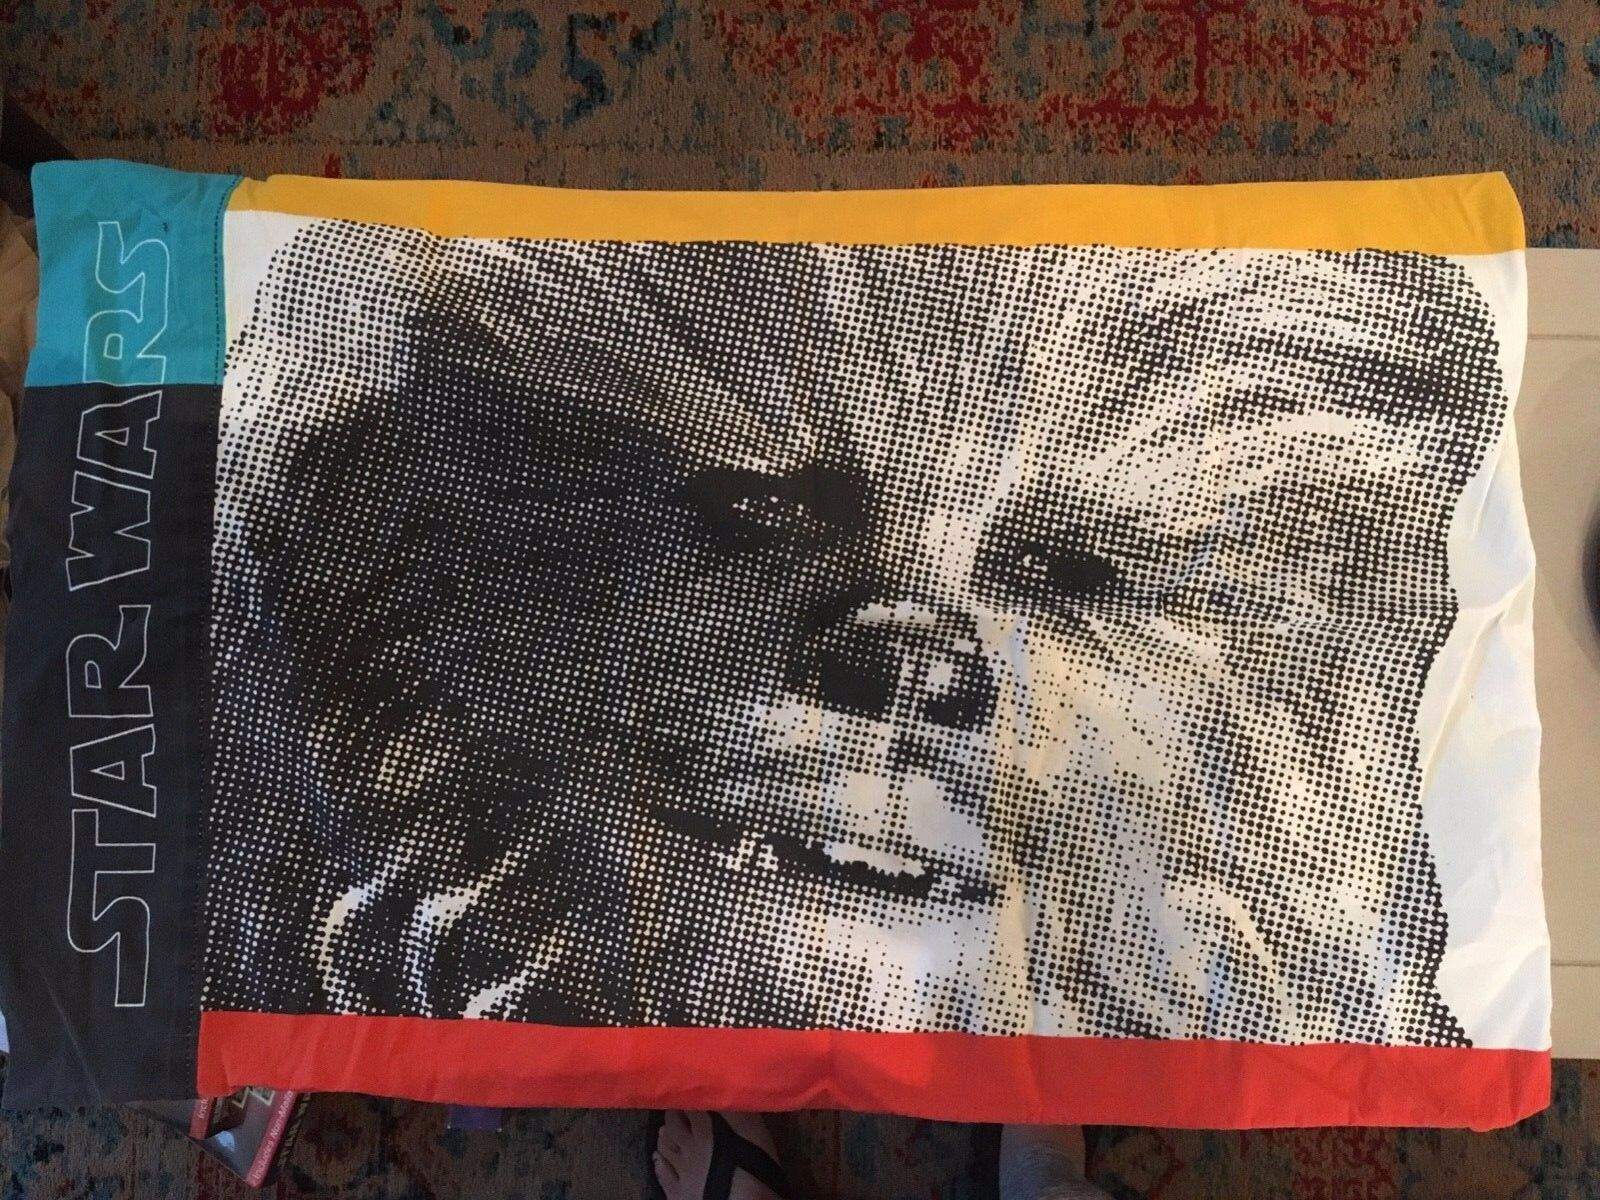 Star Wars Han Solo & Chewbacca reversible pillowcases 1997